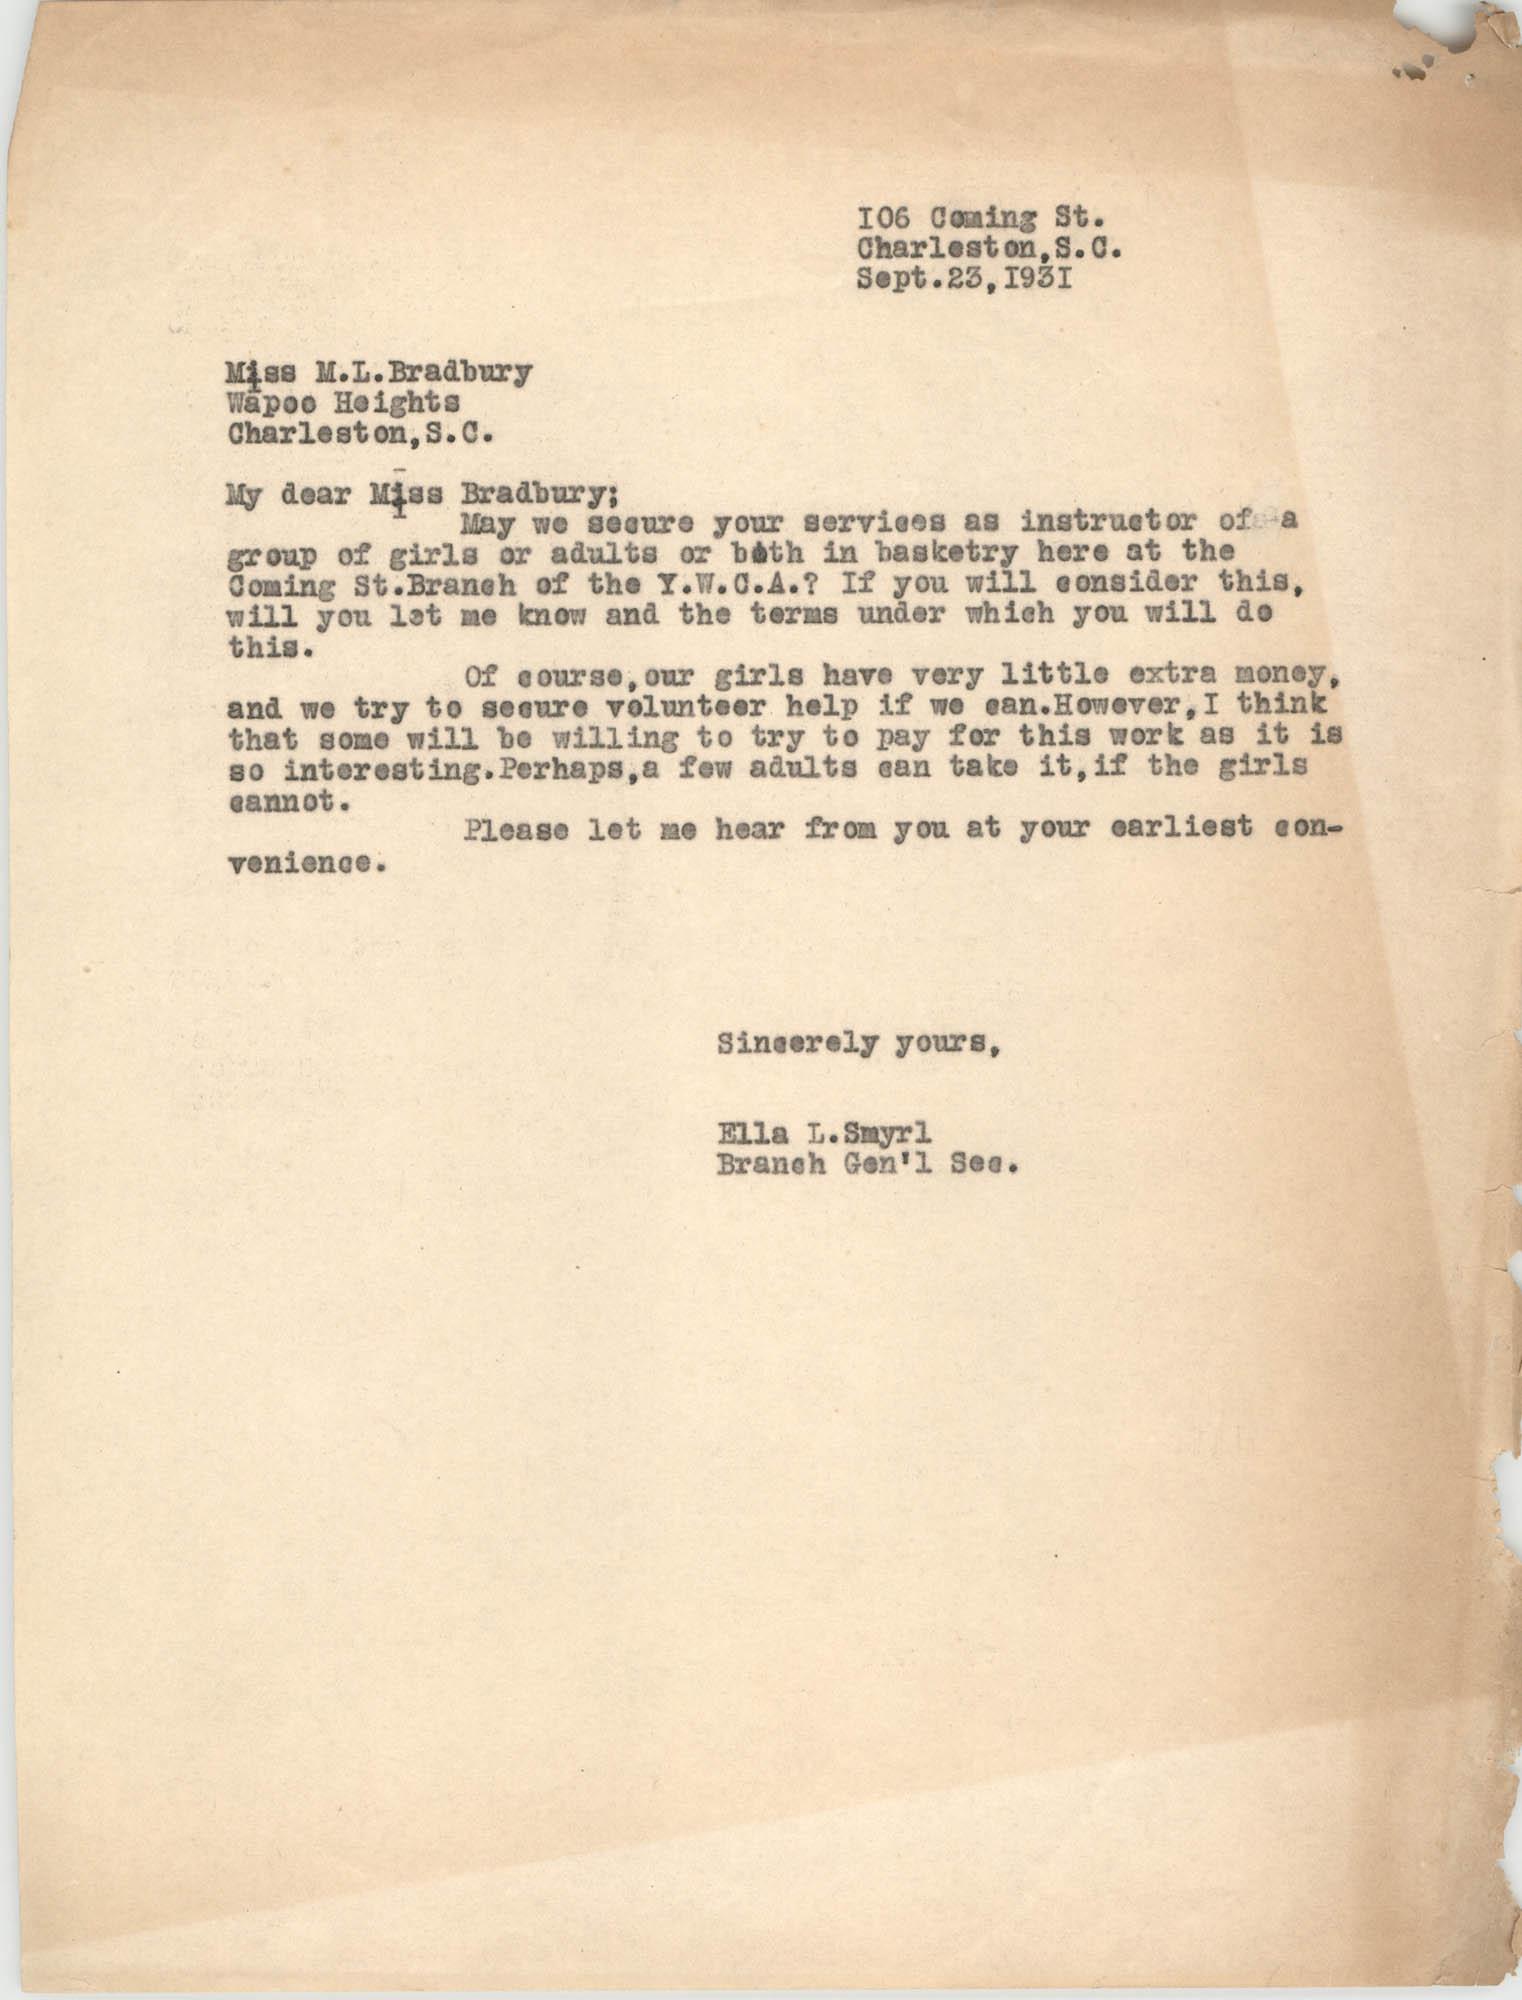 Letter from Ella L. Smyrl to M. L. Bradbury, September 23, 1931